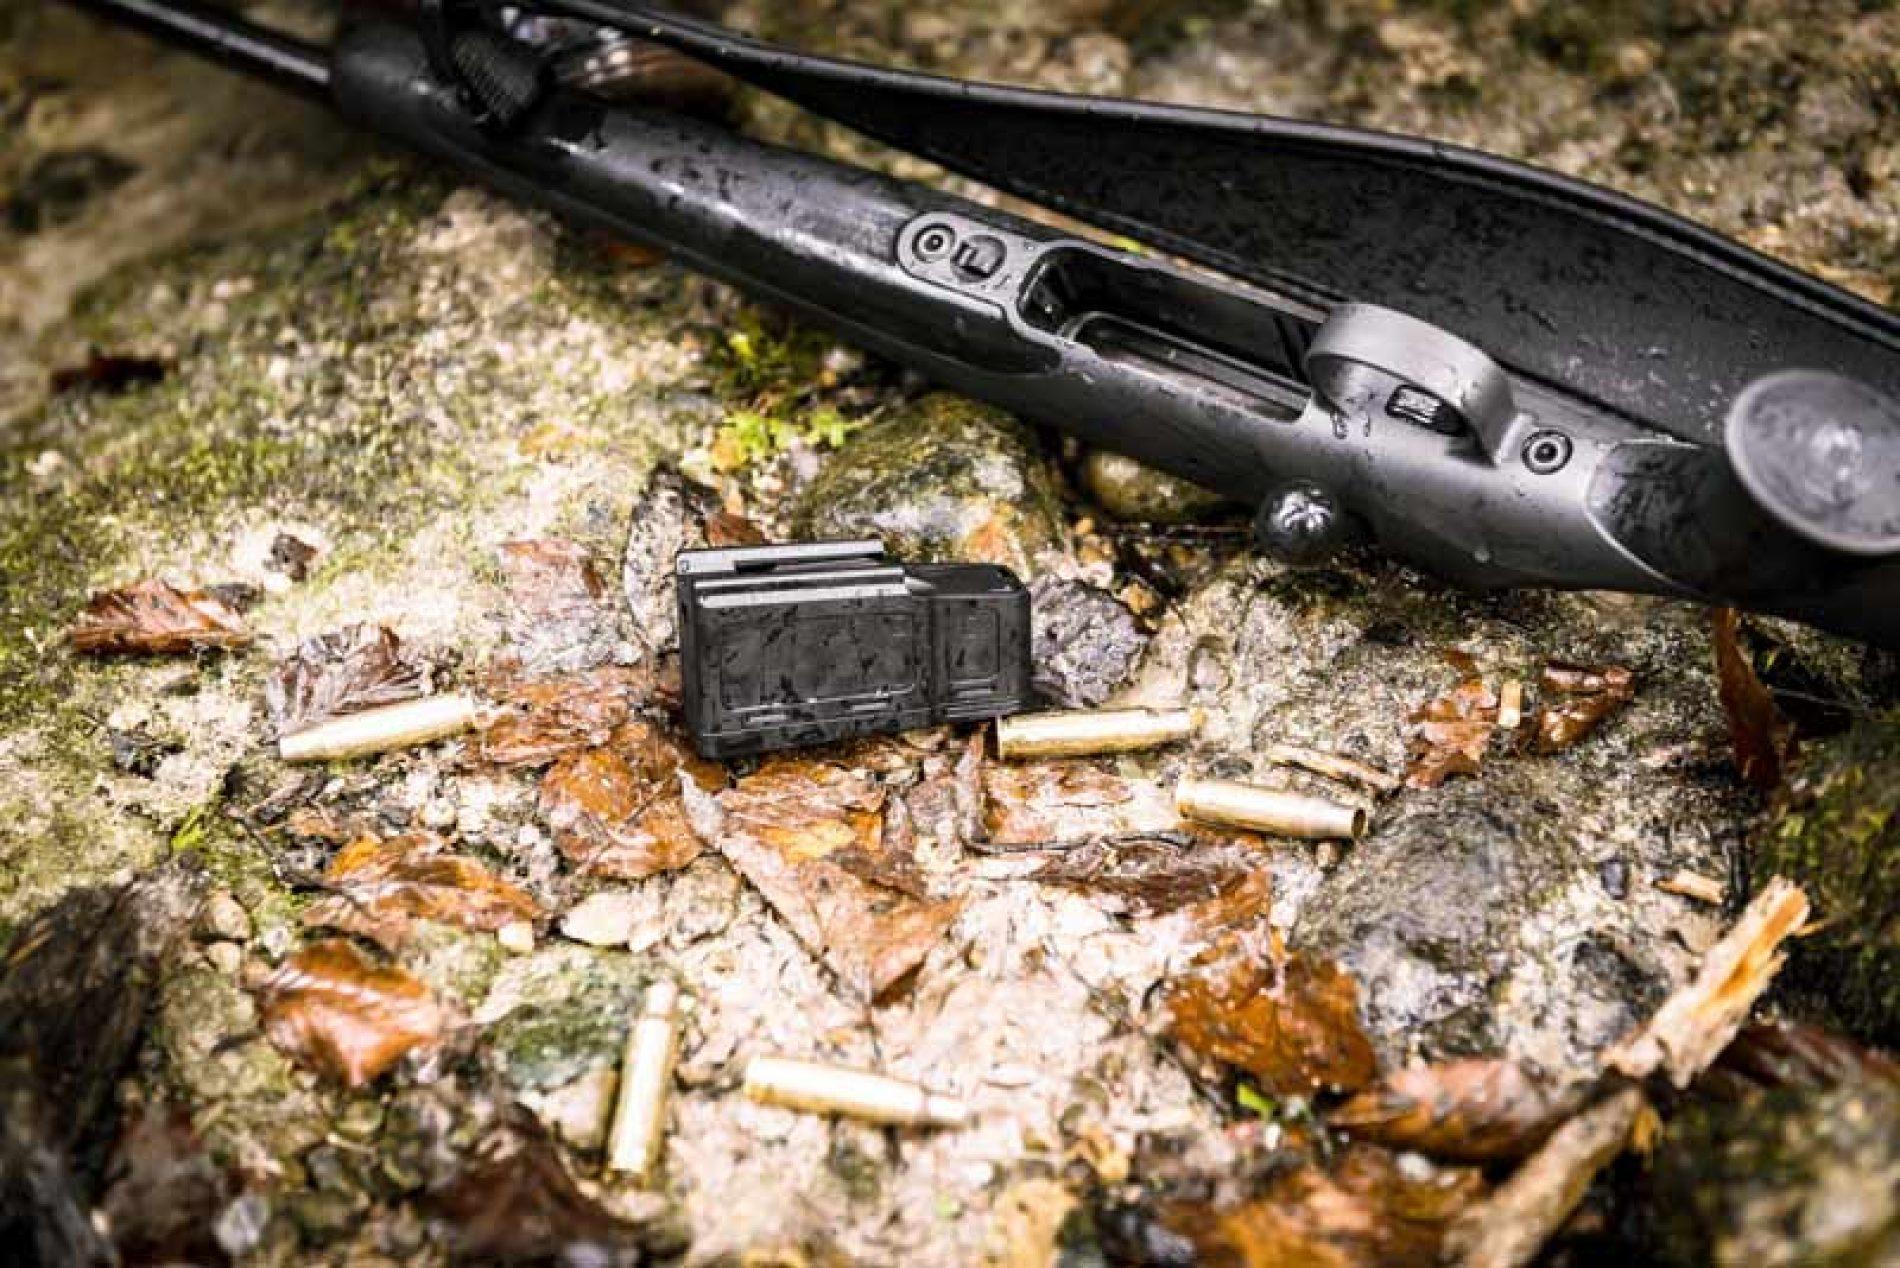 El Rifle Mauser M18 gana el prestigioso premio del Gray's Sporting Journal